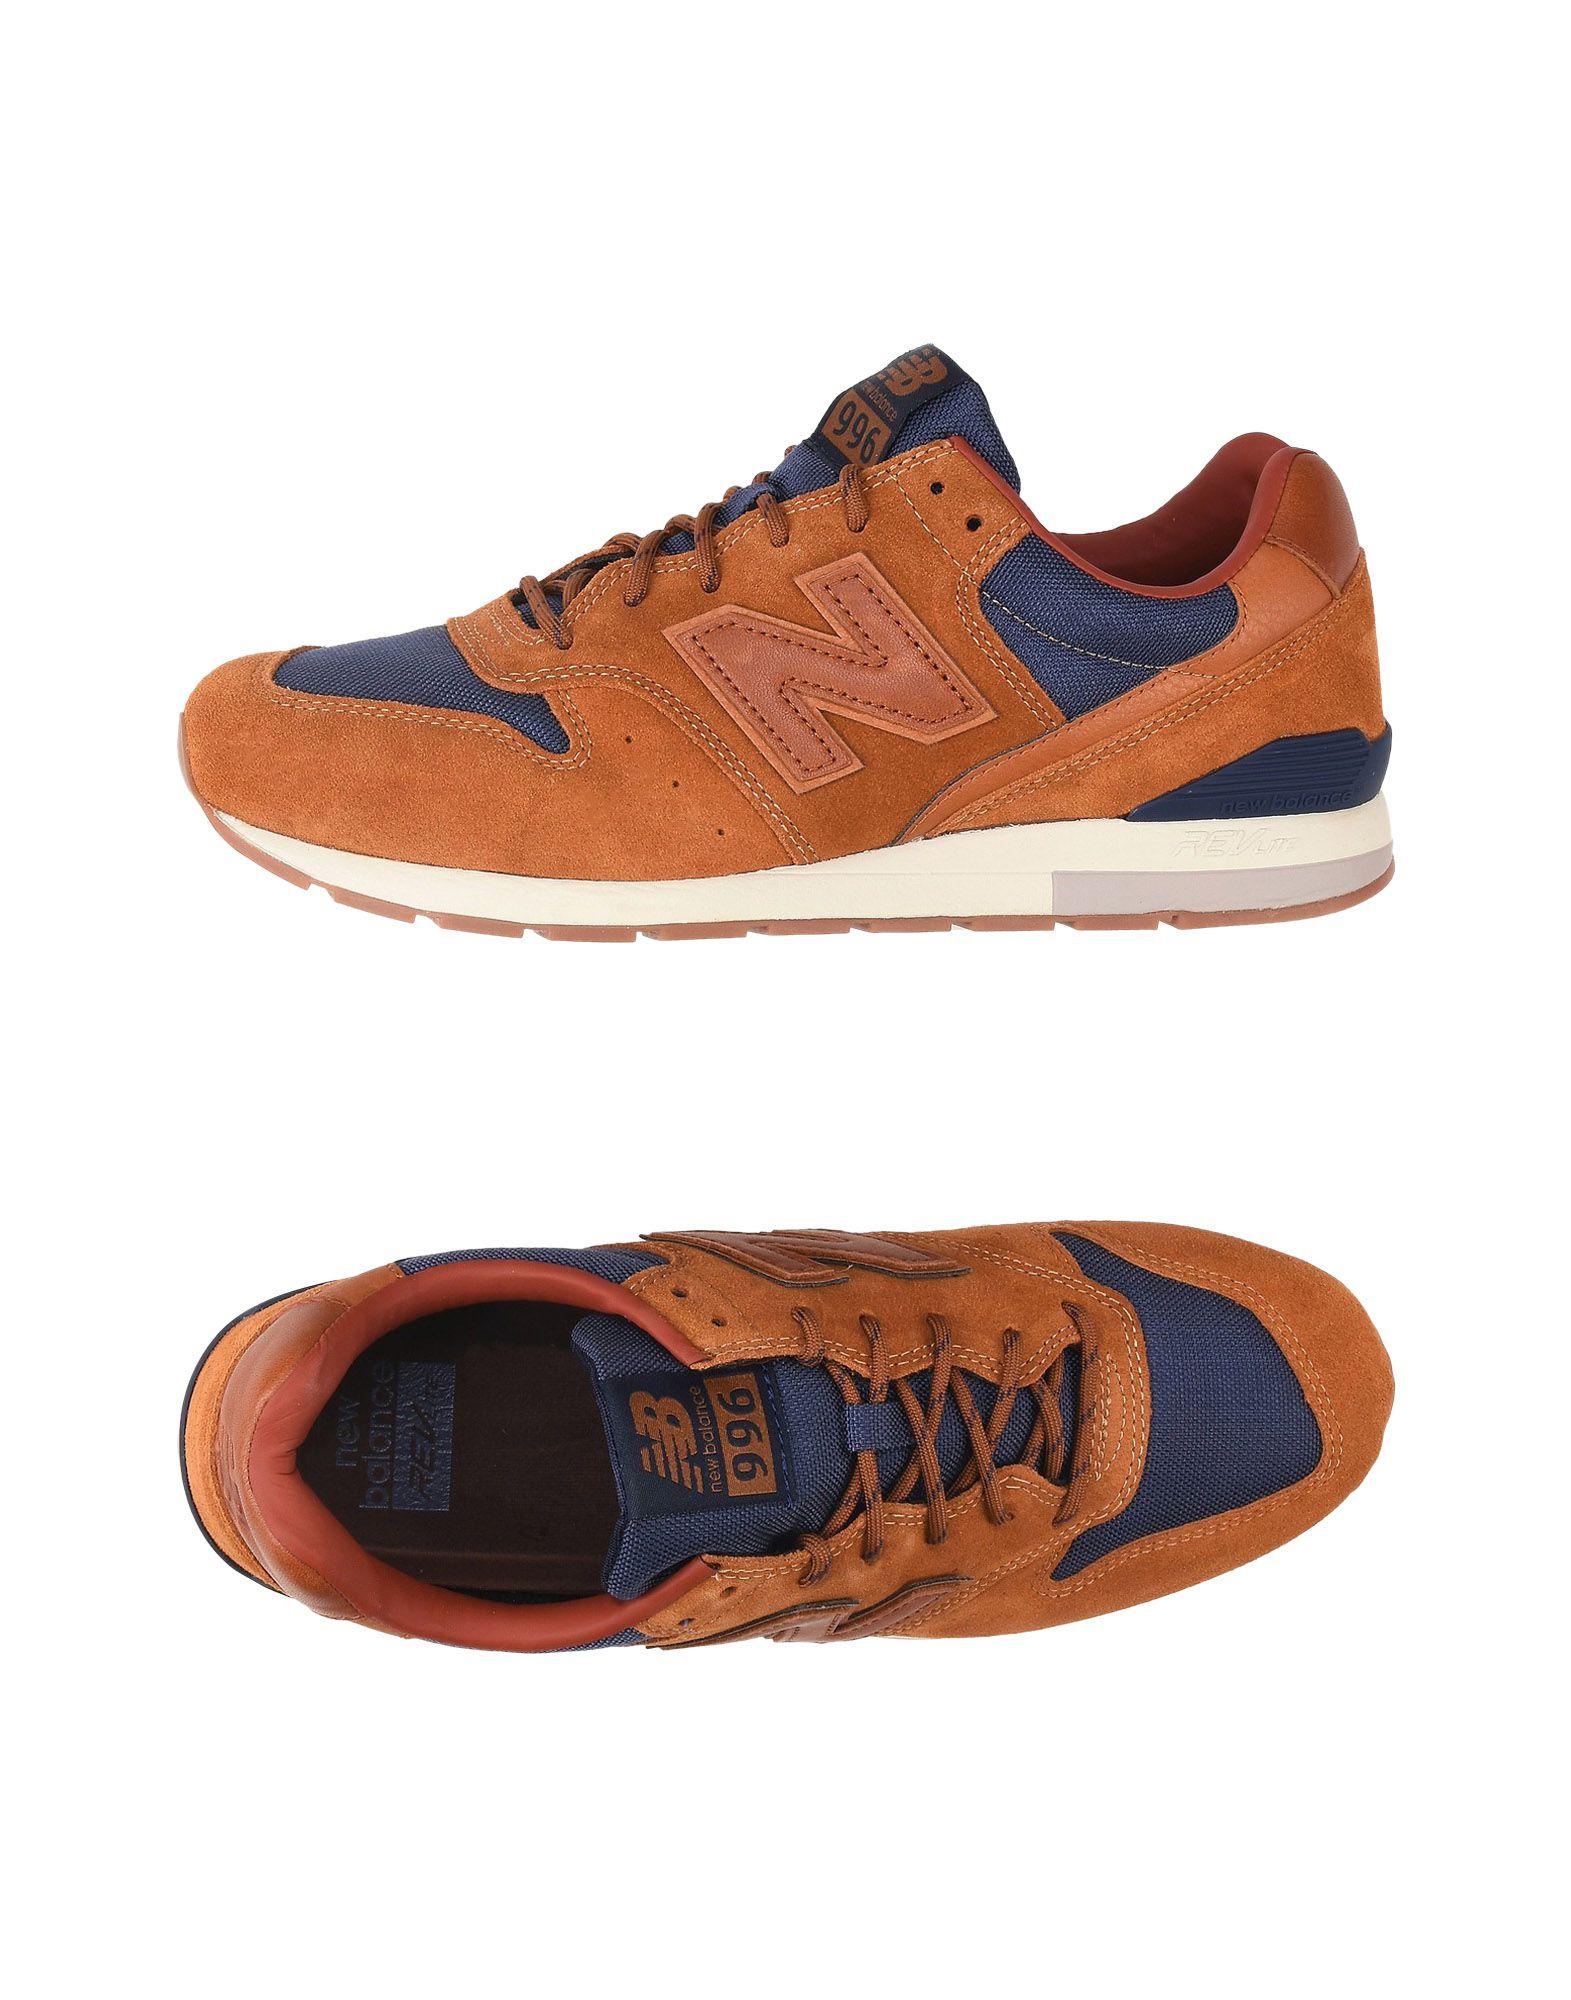 Sneakers New Balance 996 Winter Cordura Pack - Uomo - 11393155BT